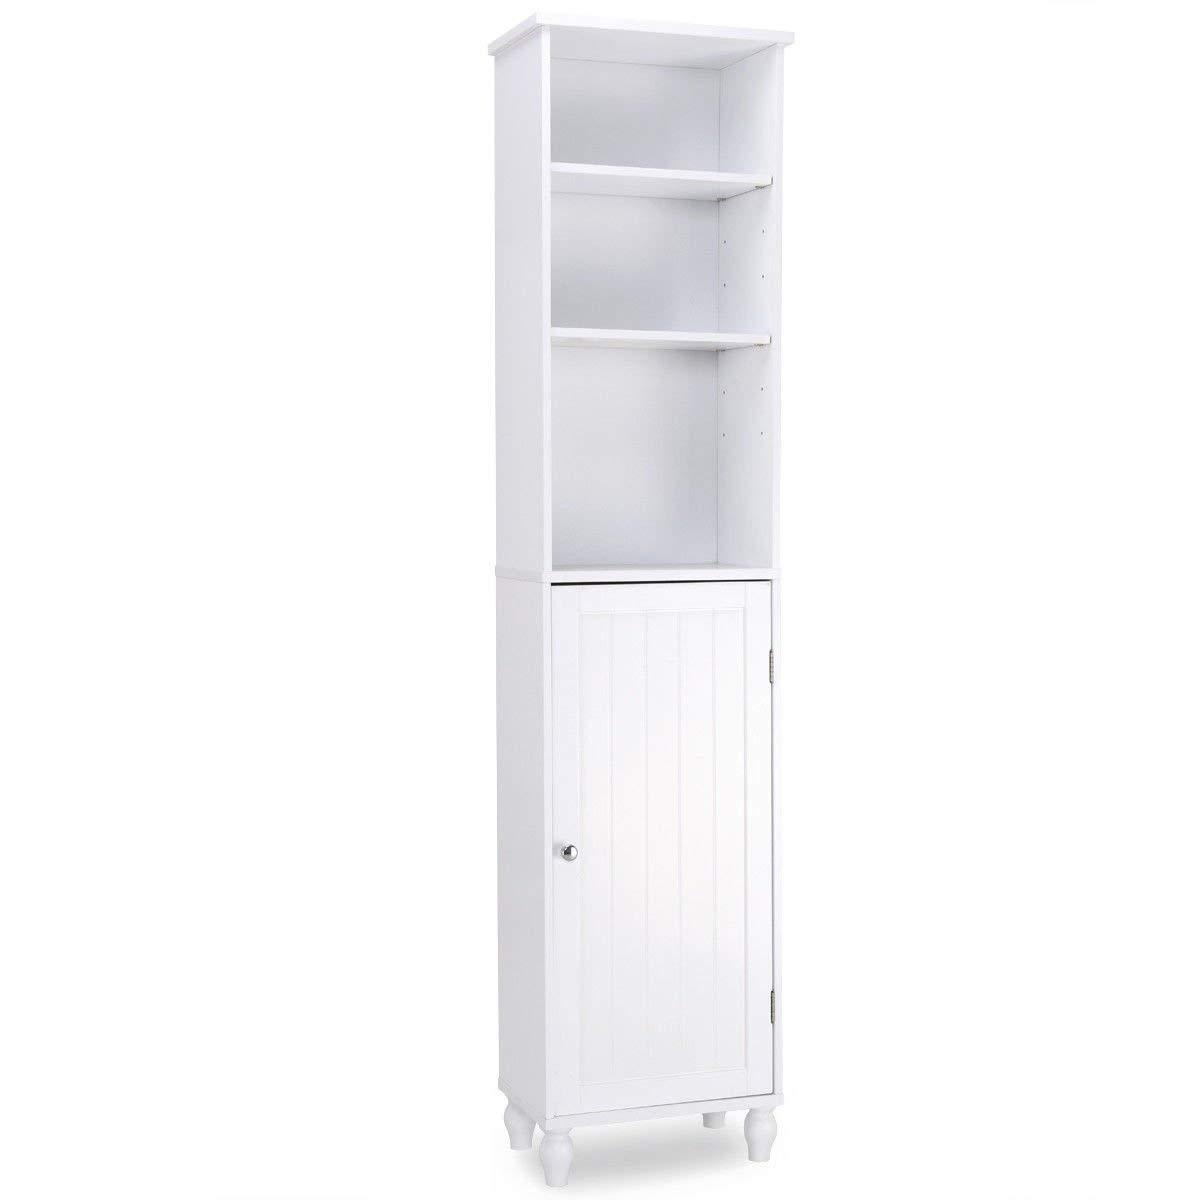 Giantex Storage Cabinet Free Standing Tower Shelf Bath Cabinet Home Kitchen, Living Room, Bathroom Storage Cabinet Wood Adjustable Shelves and Cabinet, White HW57022New